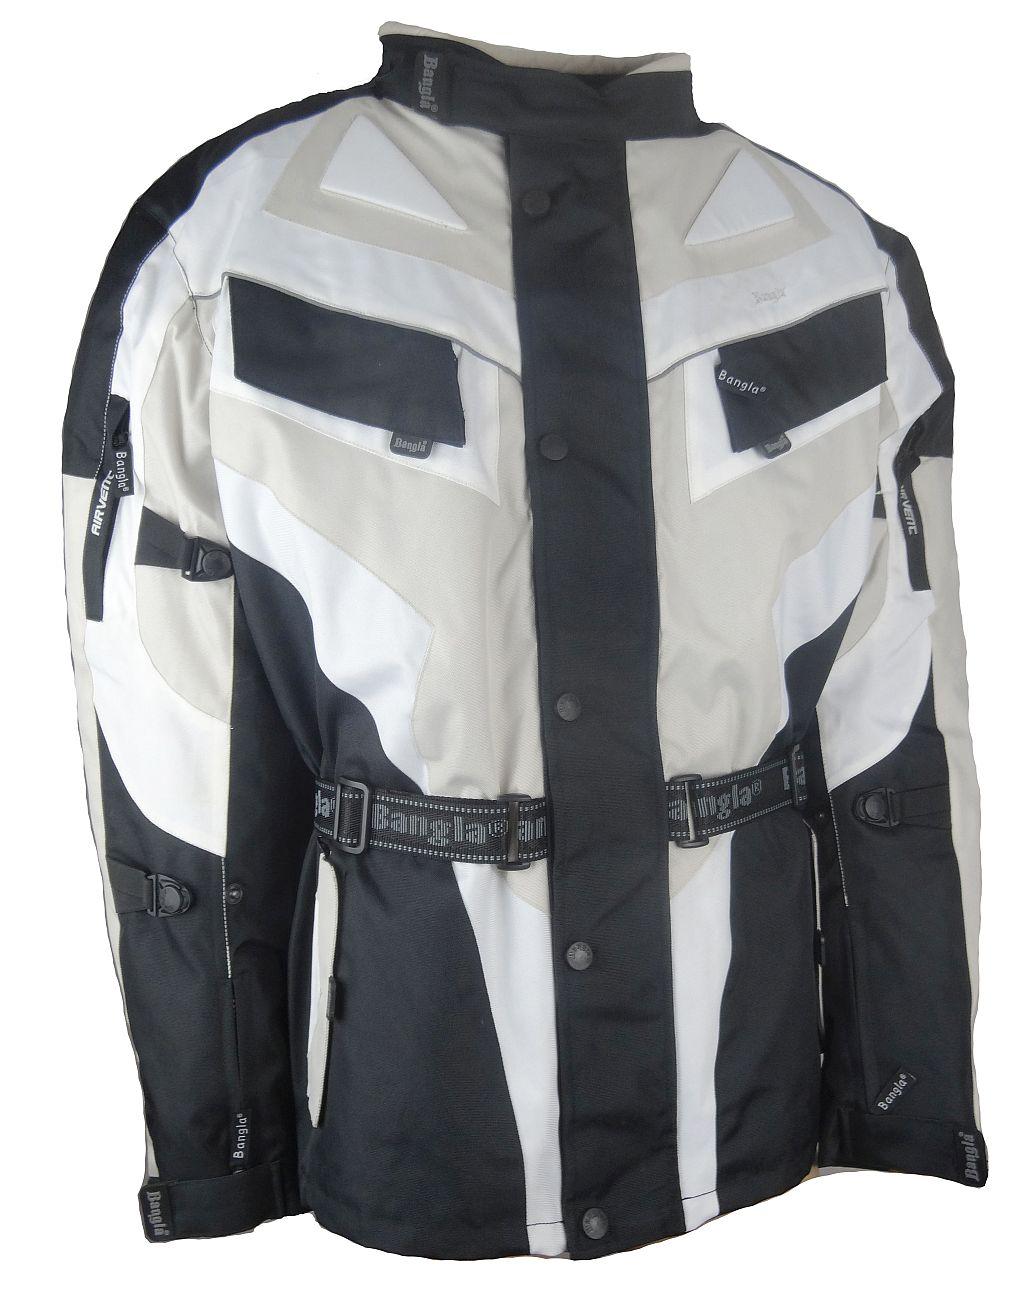 Bangla Motorrad Jacke Motorradjacke Textil Cordura beige schwarz weiss 5 - 8 XL